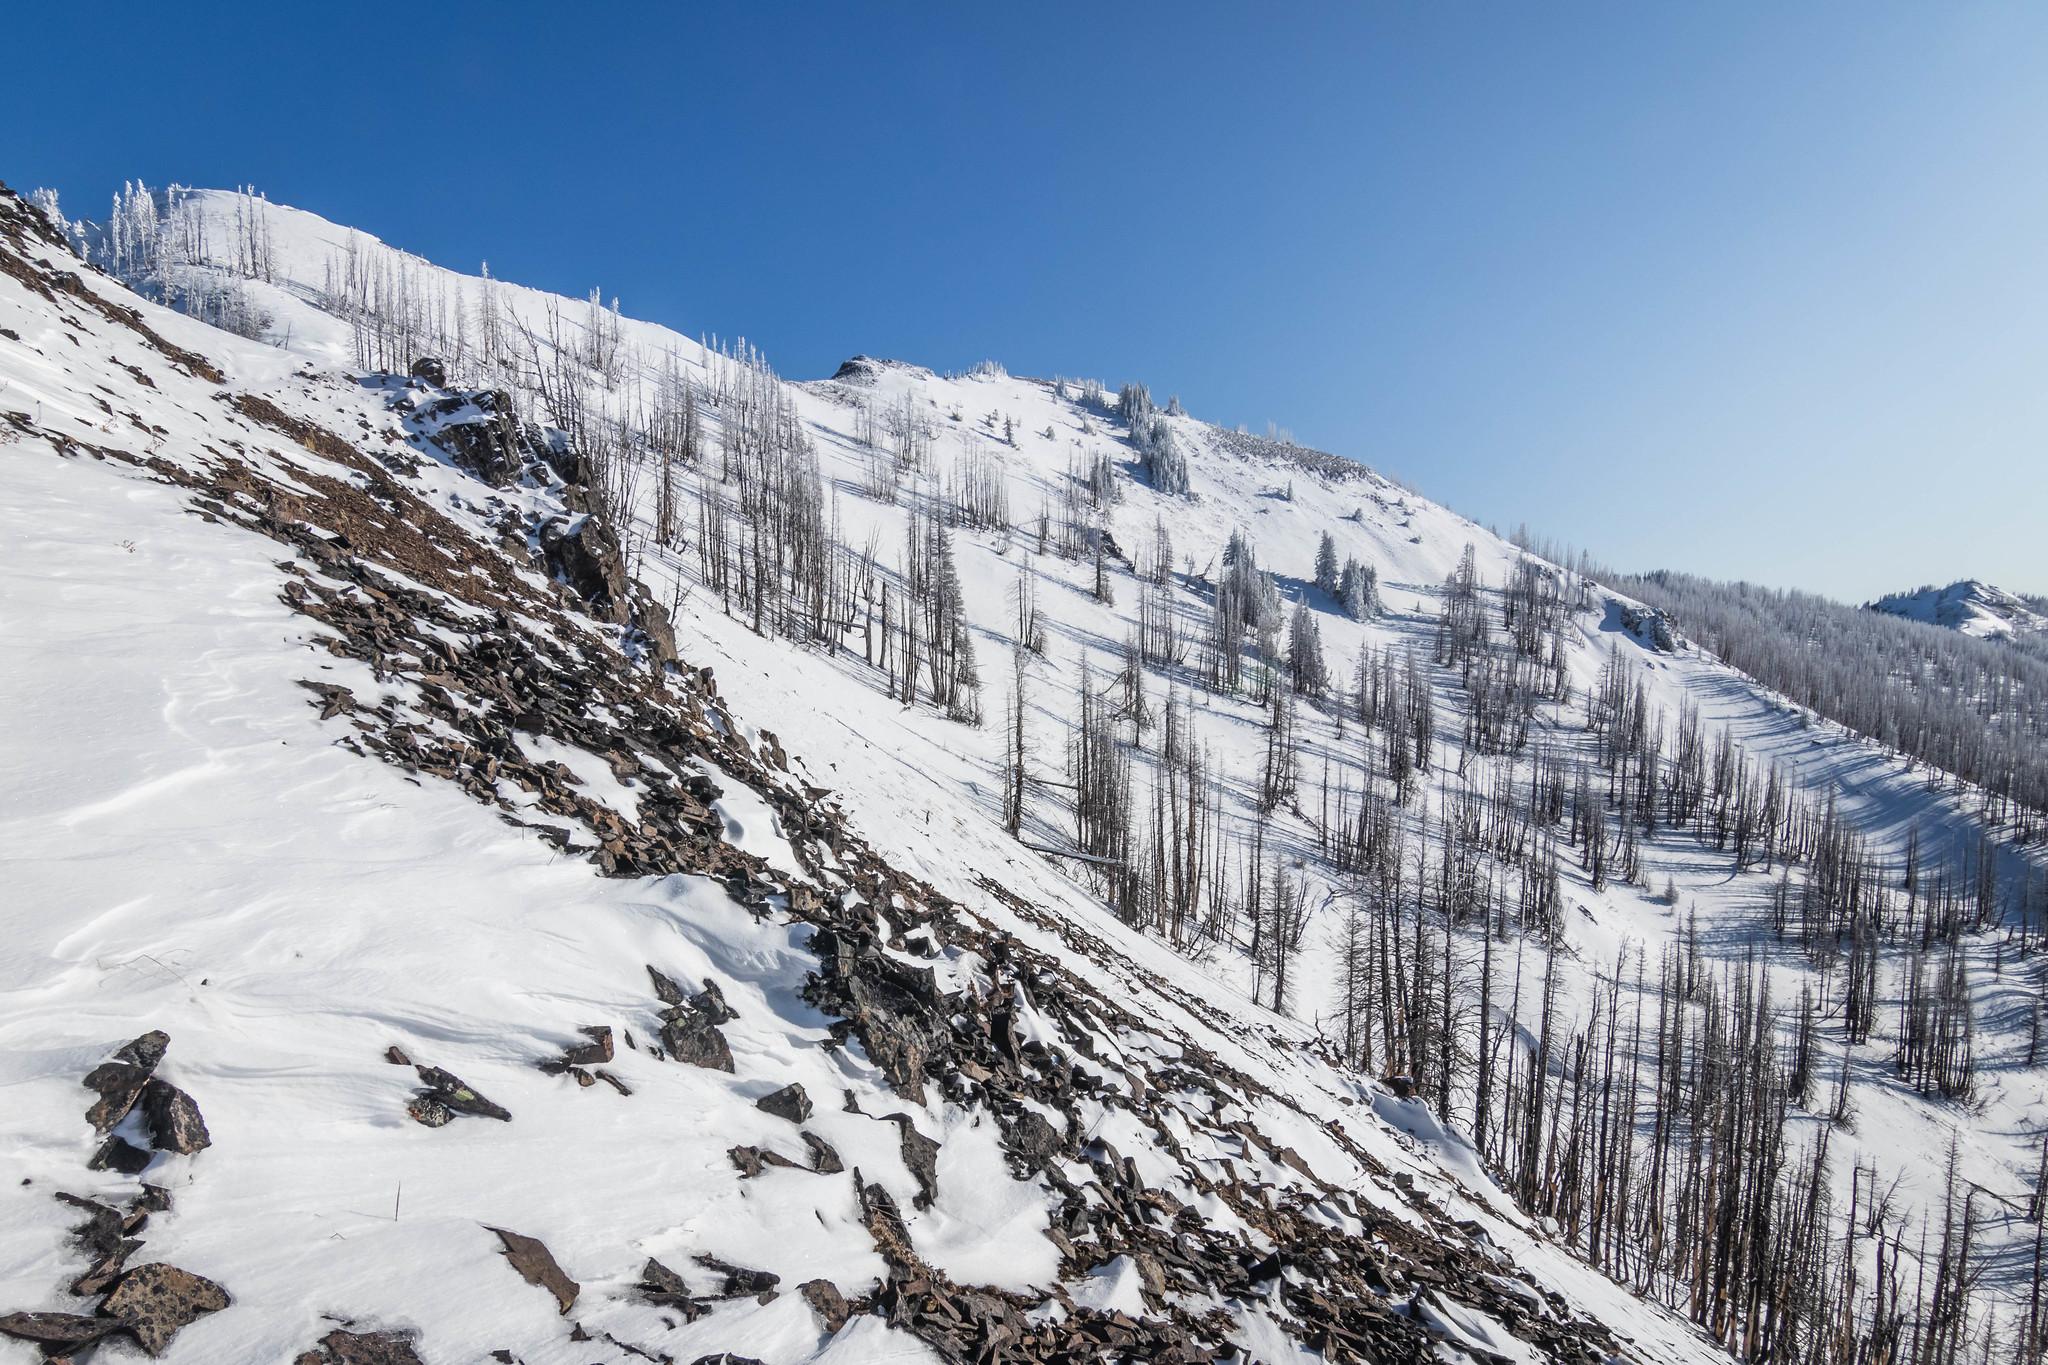 Norse Peak morthwest ridgeline